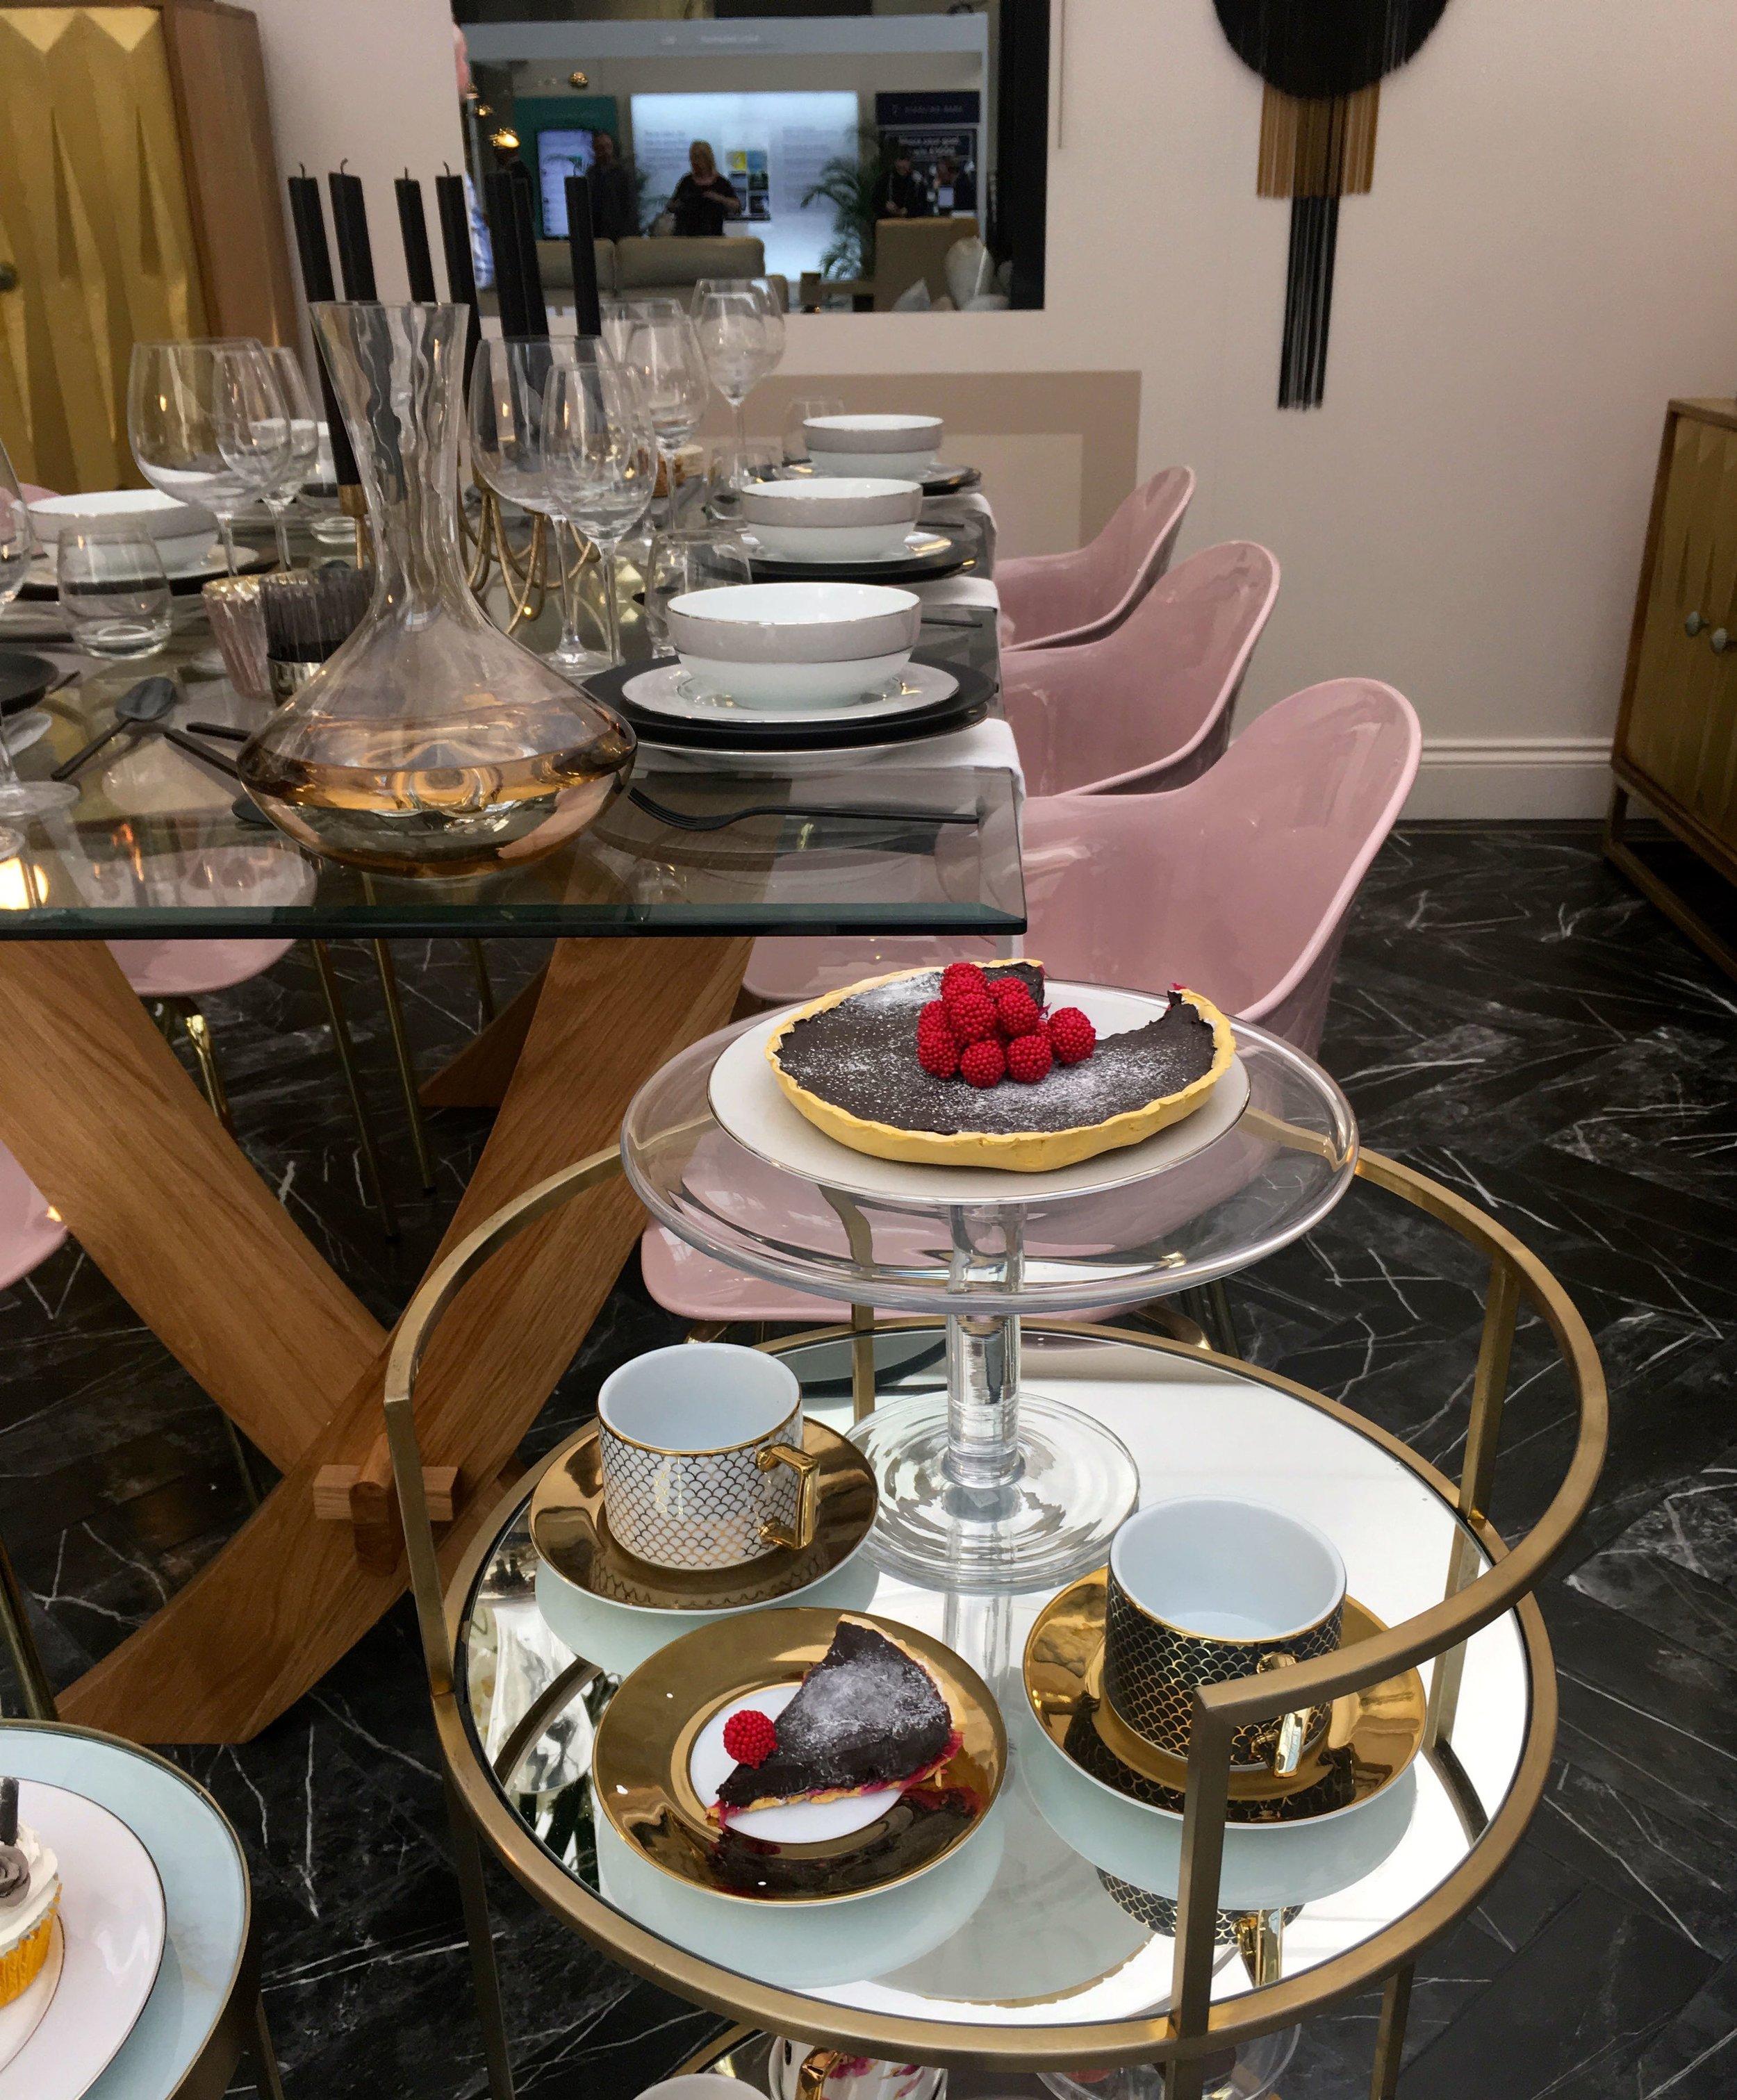 afternoon tea on a gilt trolley